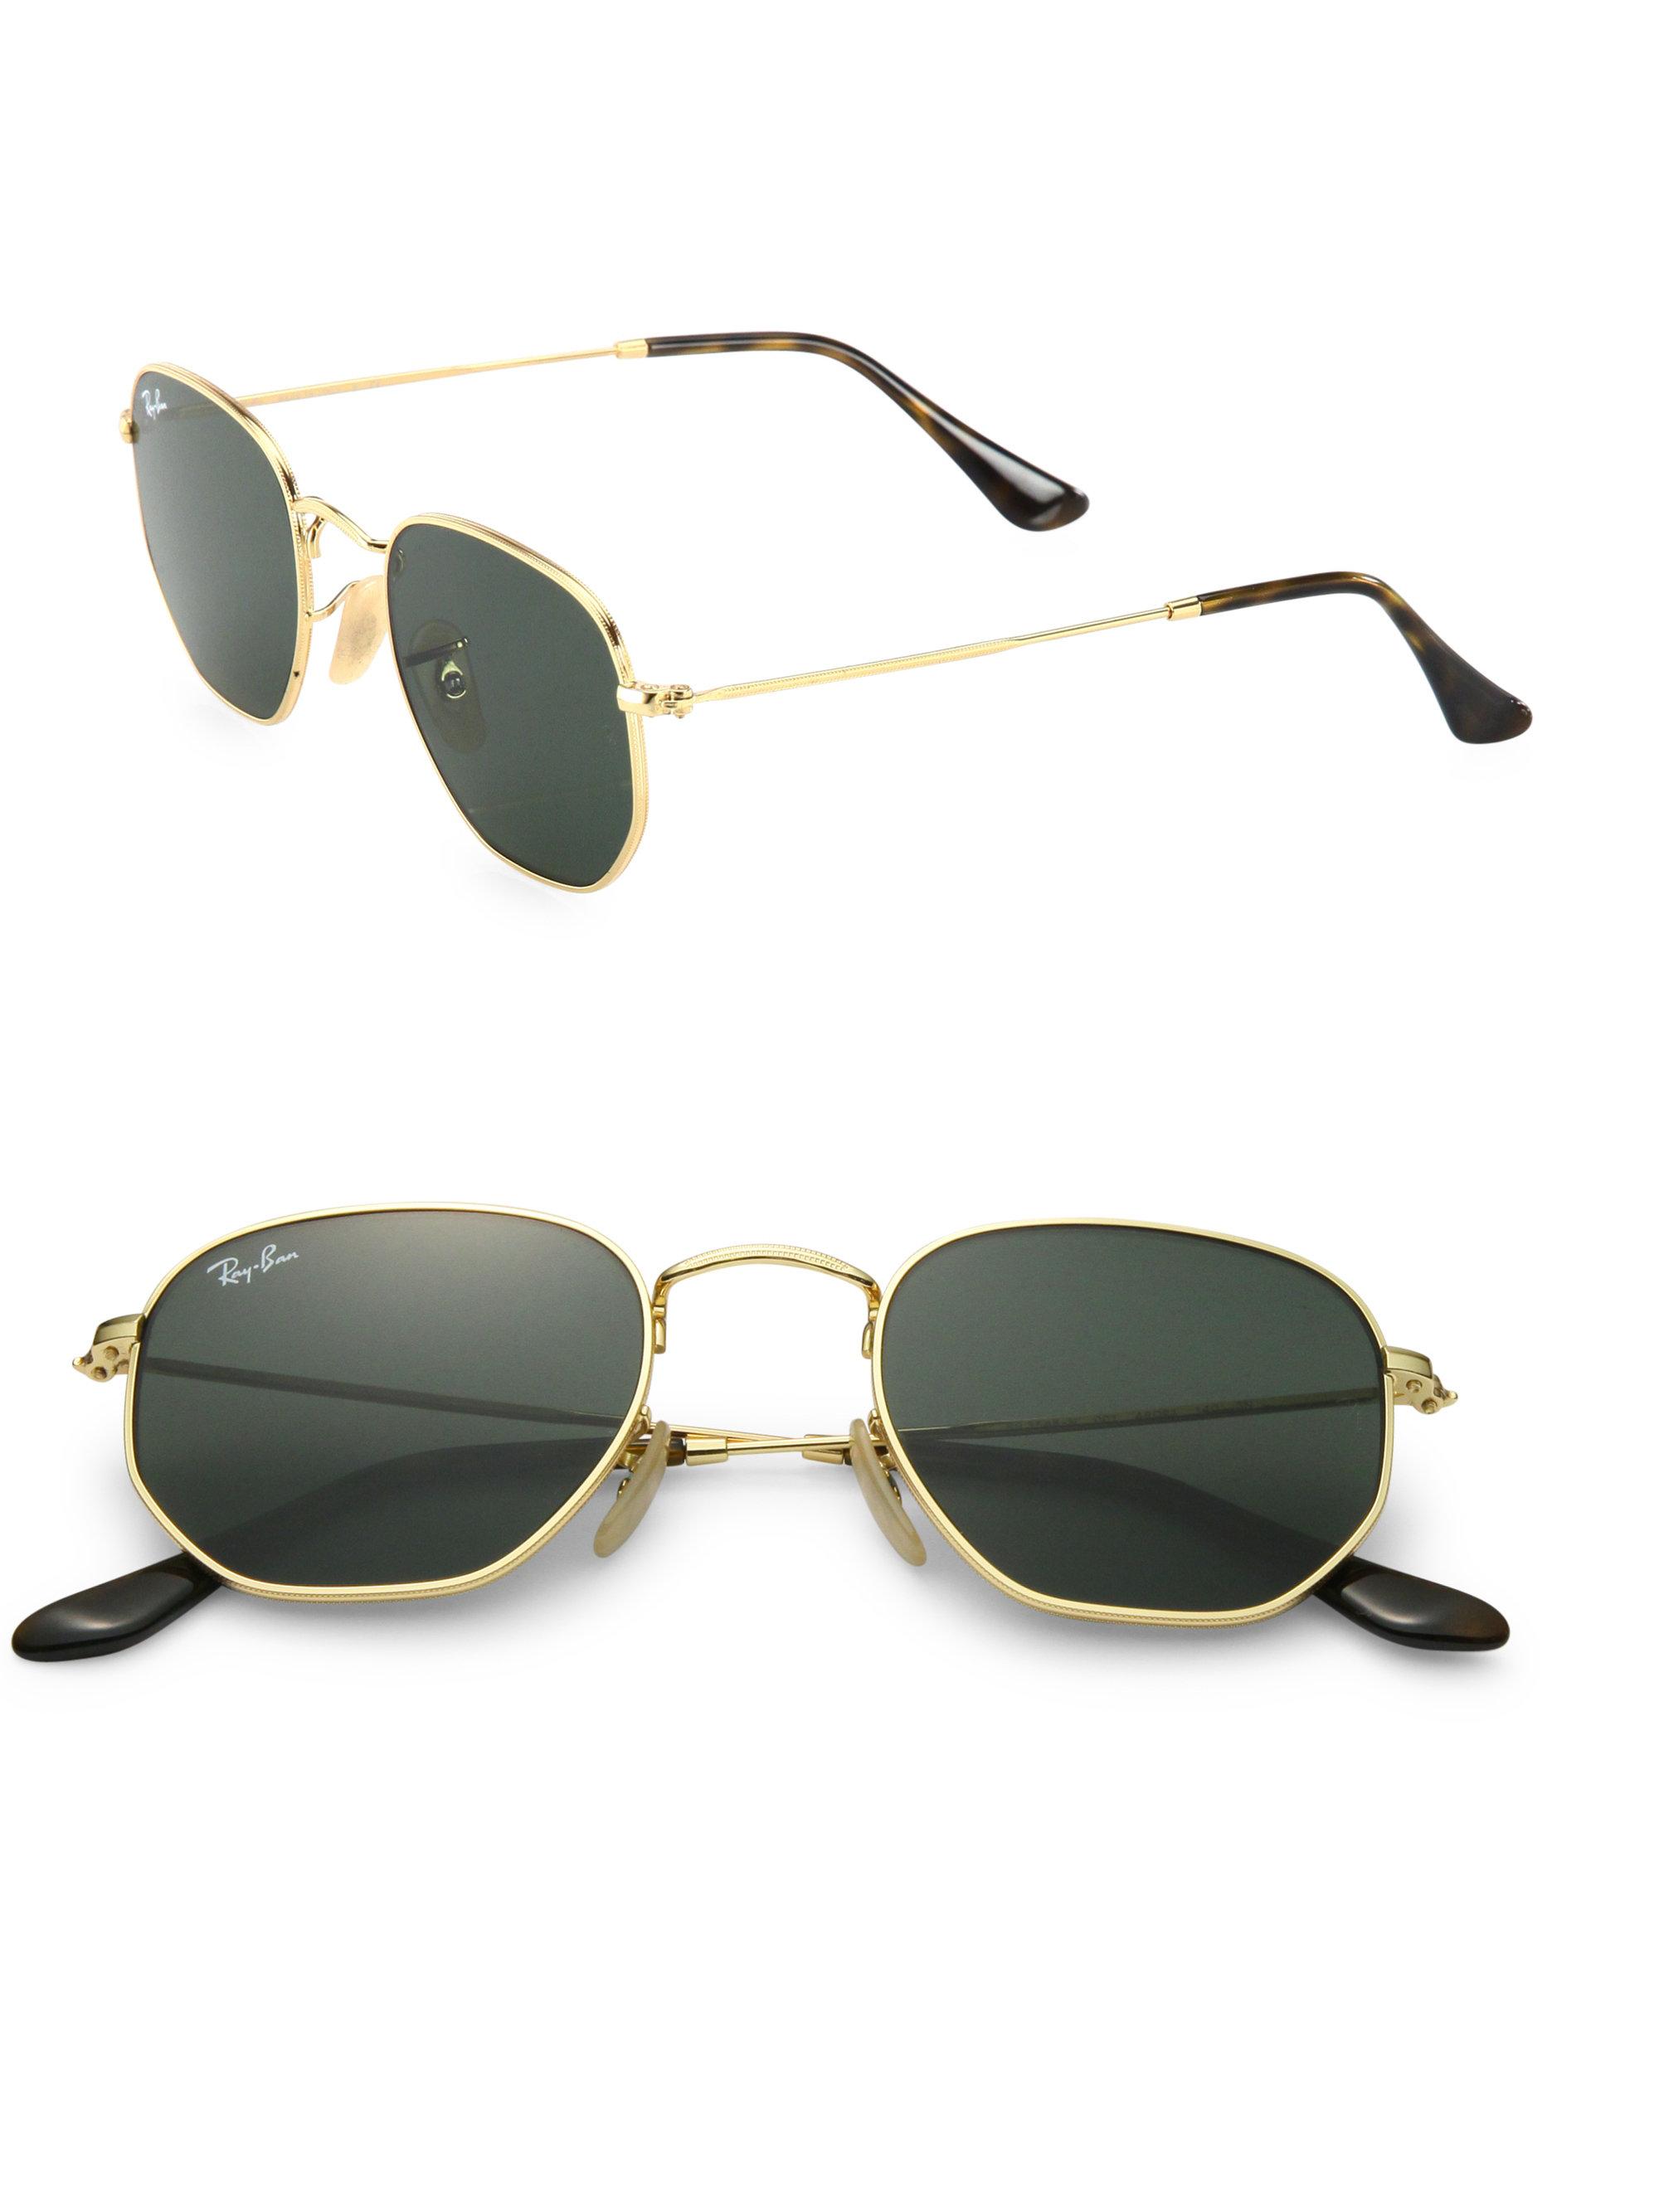 aaf4a1f431 Ray Ban Rb 3186 Sunglasses Hut « Heritage Malta